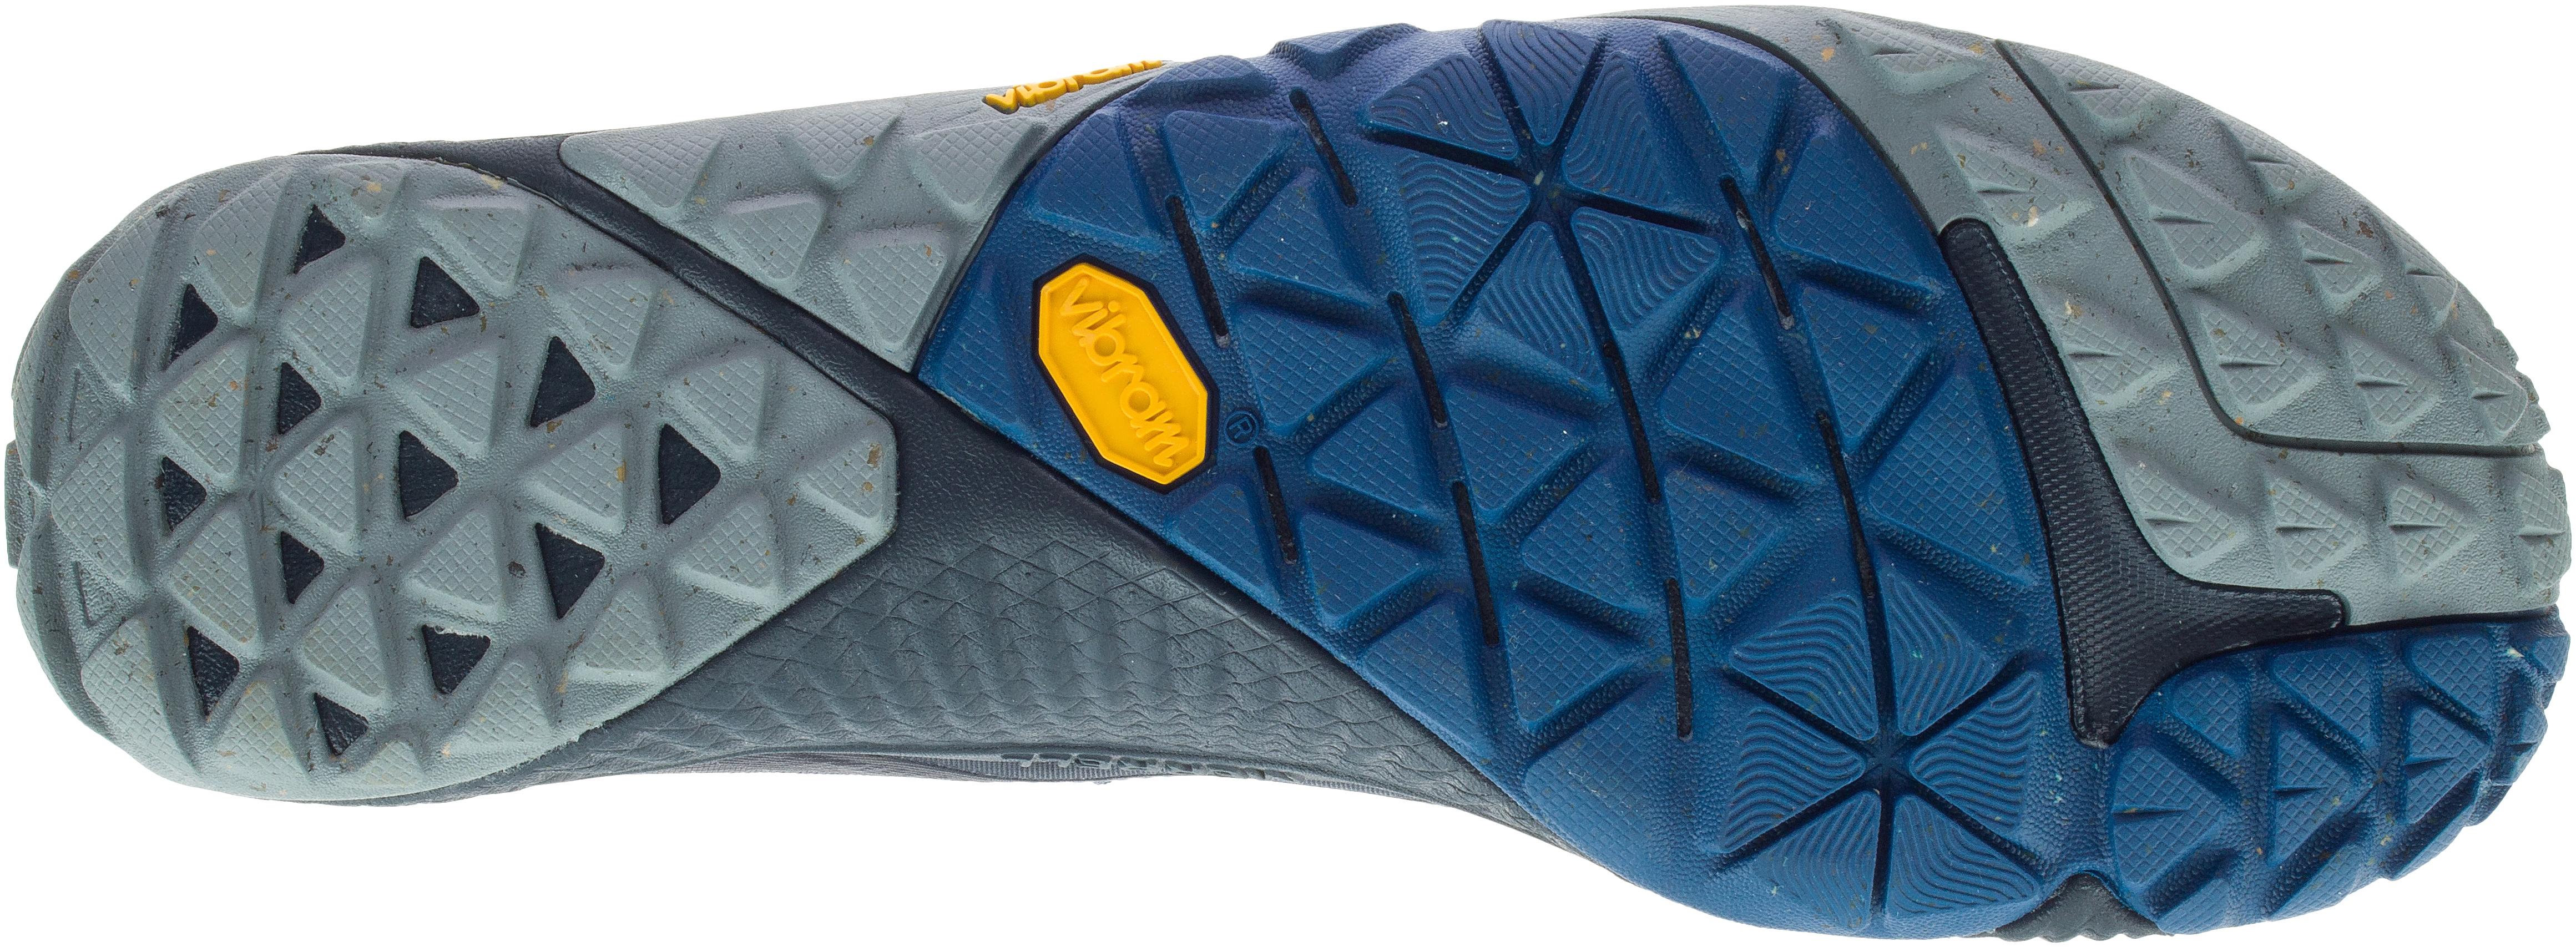 Trail Glove 6, Poseidon